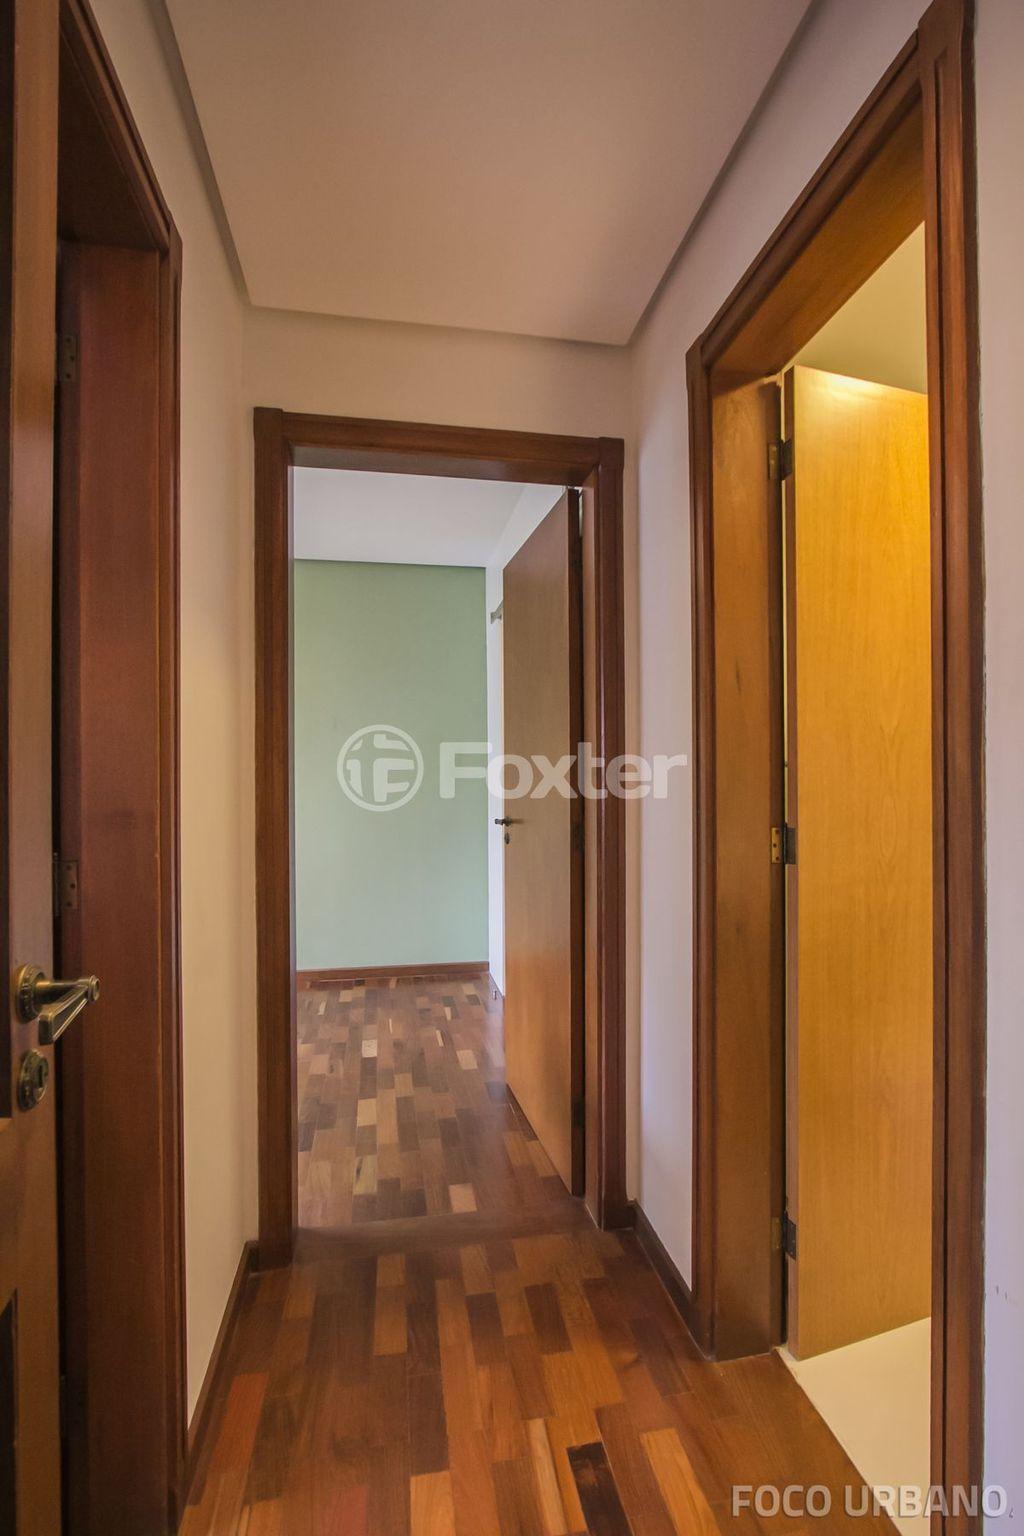 Cobertura 4 Dorm, Floresta, Porto Alegre (130941) - Foto 11